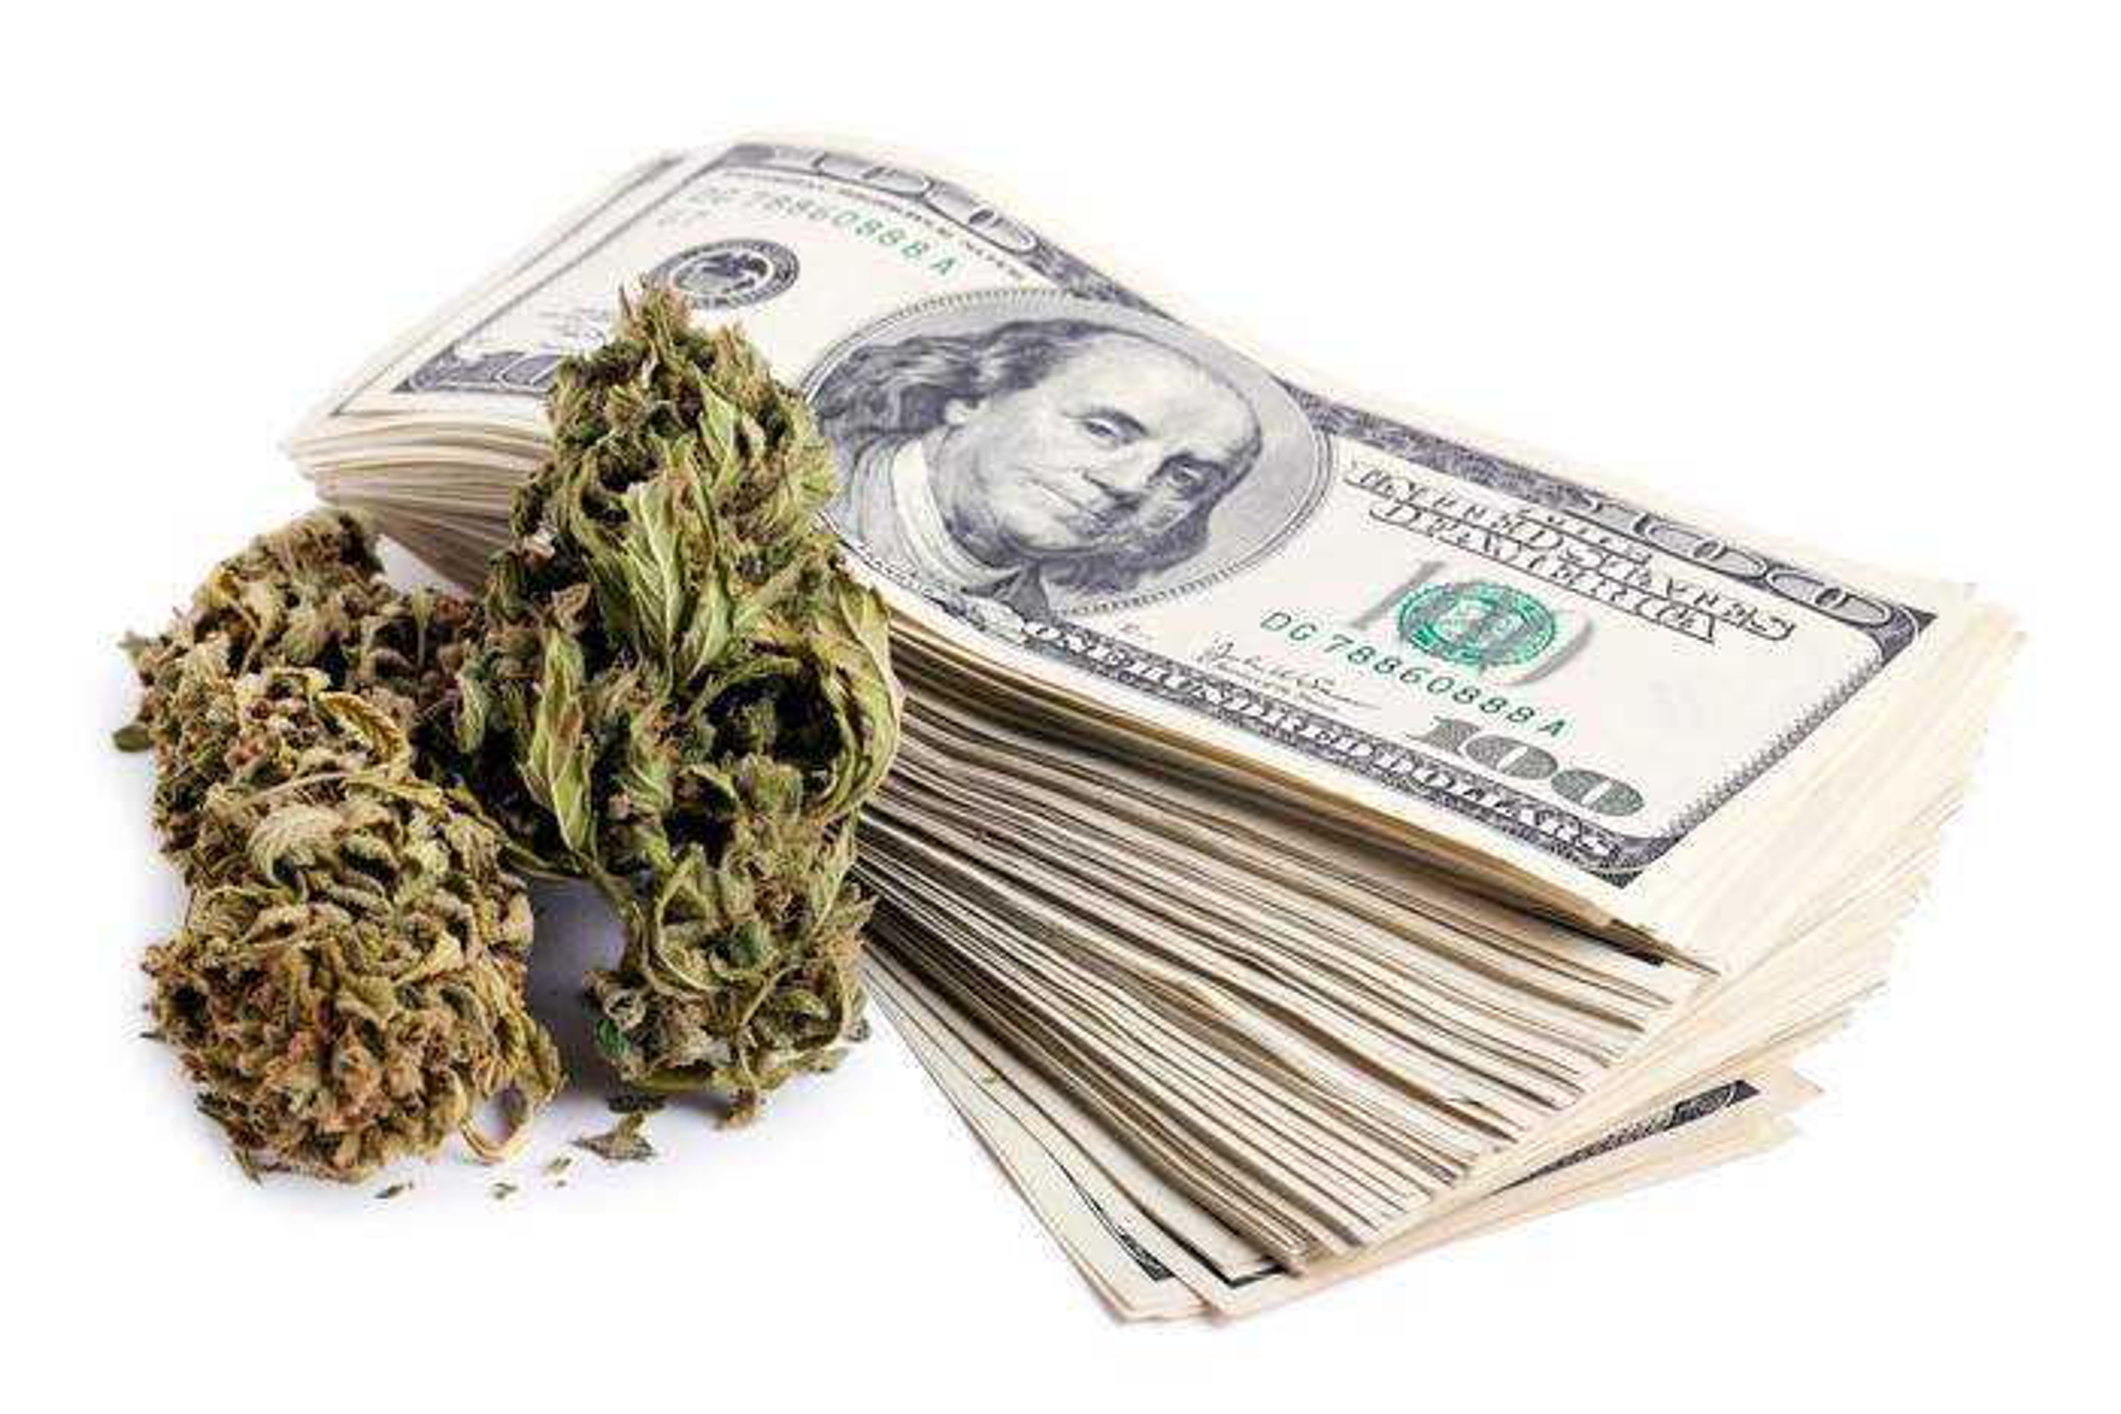 Marijuana buds sitting next to a stack of $100 bills.